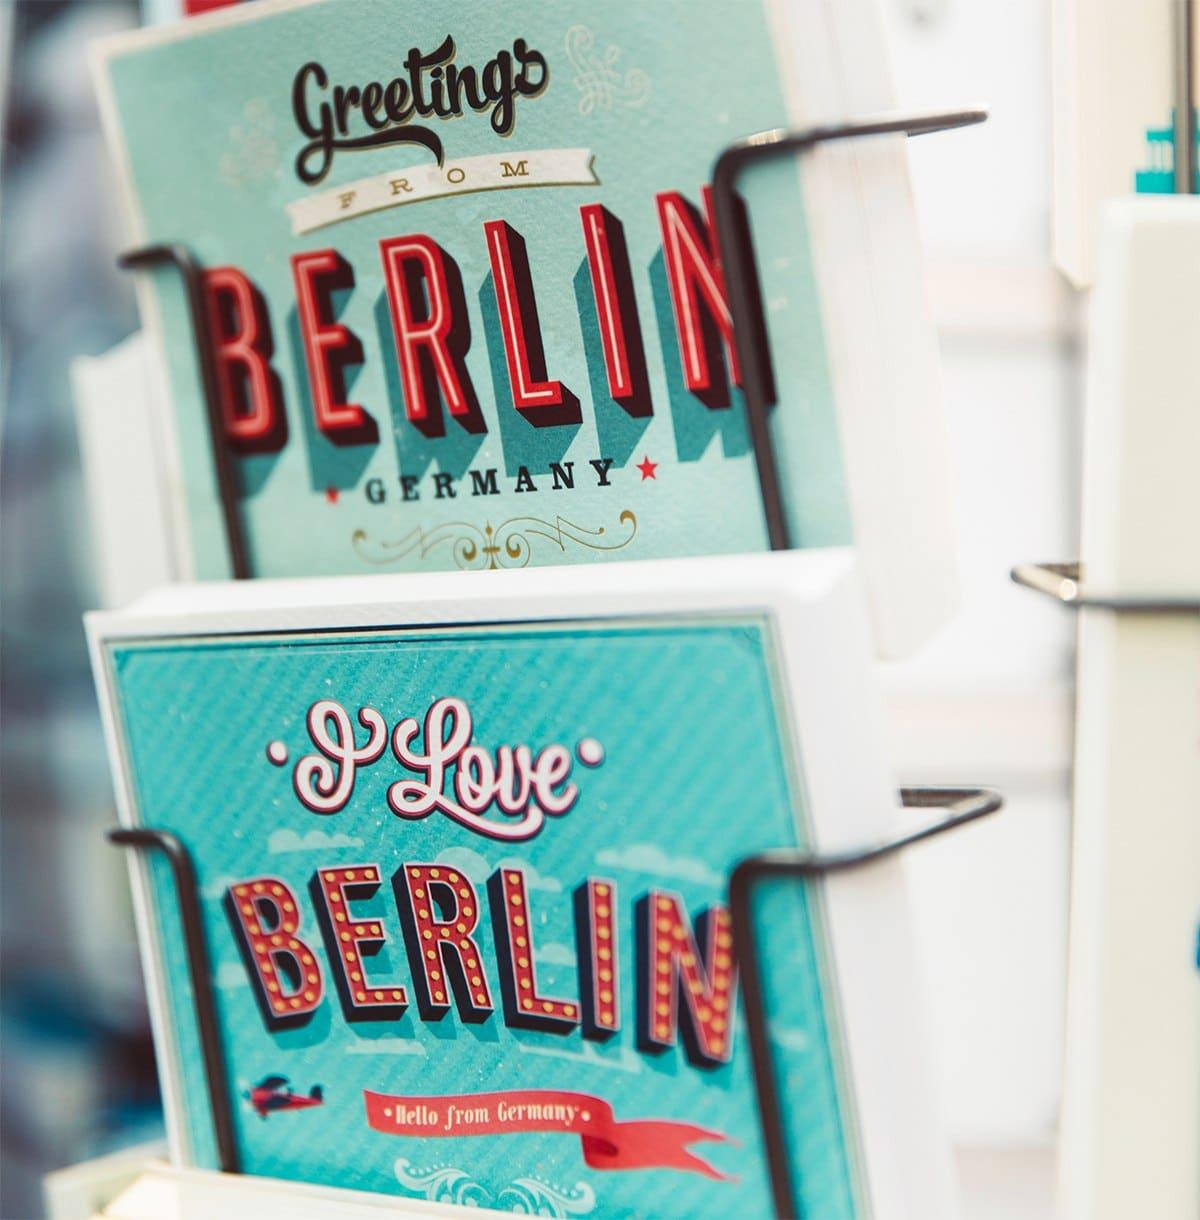 CiscoLive! Berlin